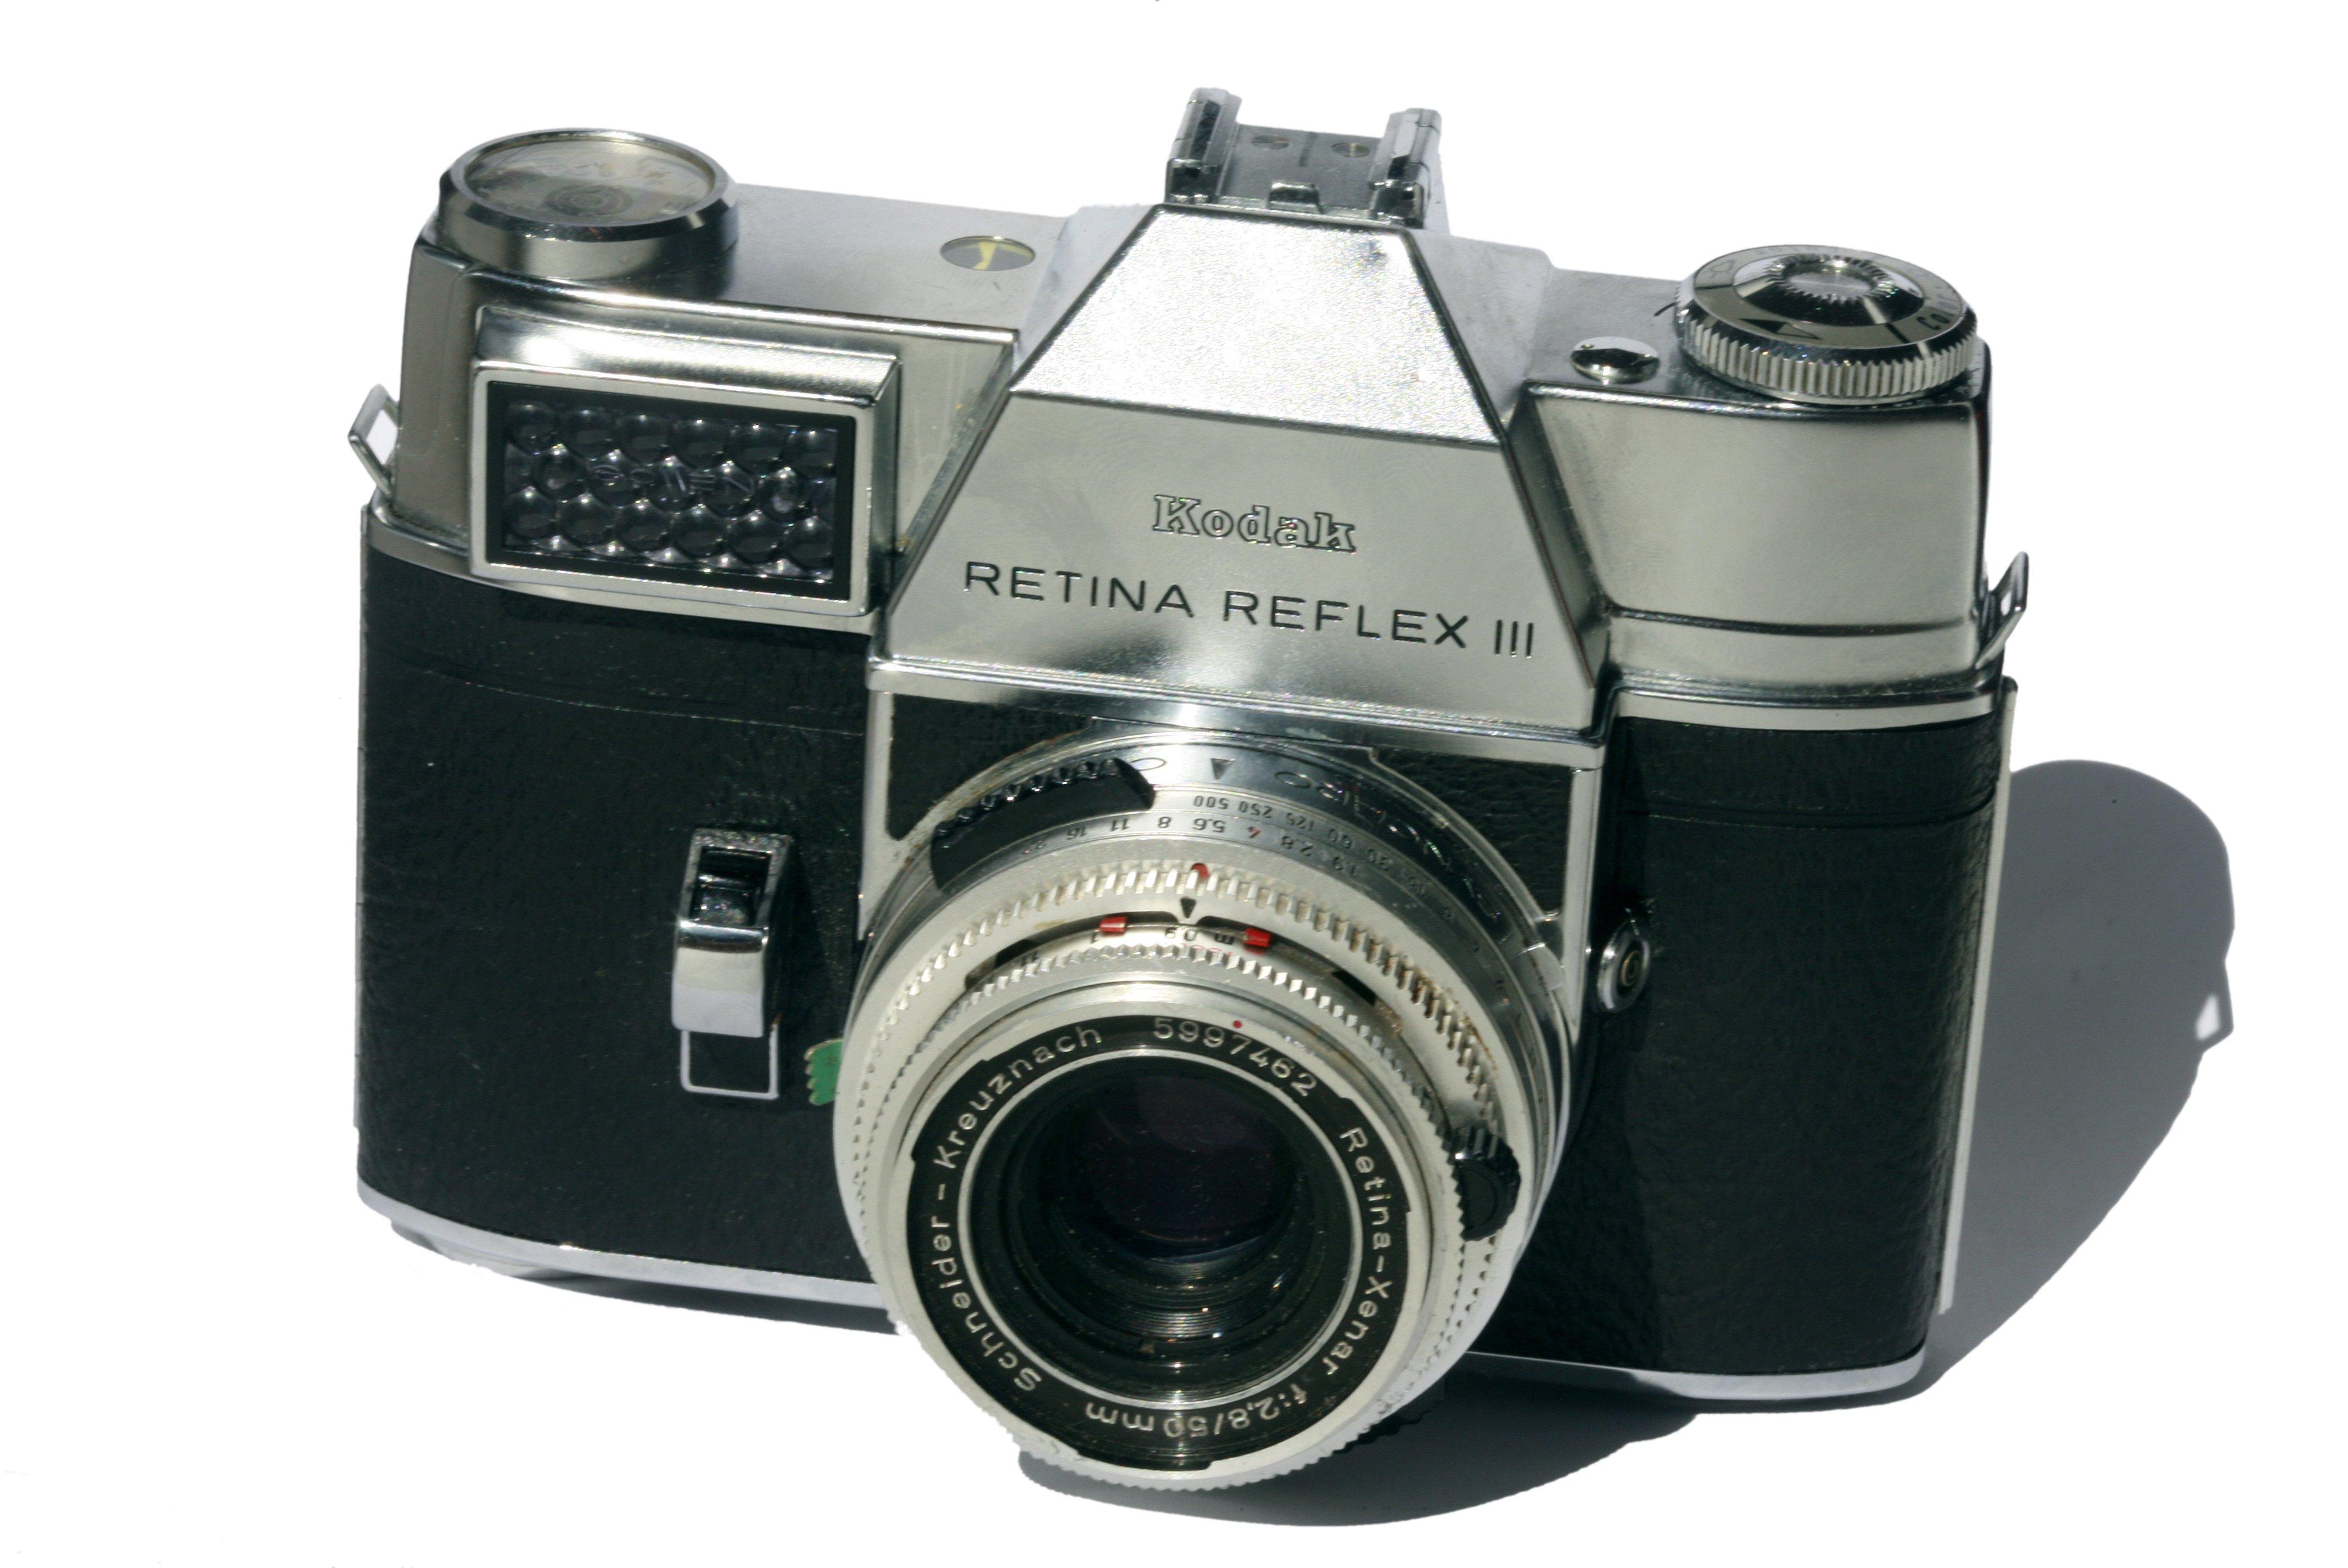 Kodak Retina Reflex - Wikipedia